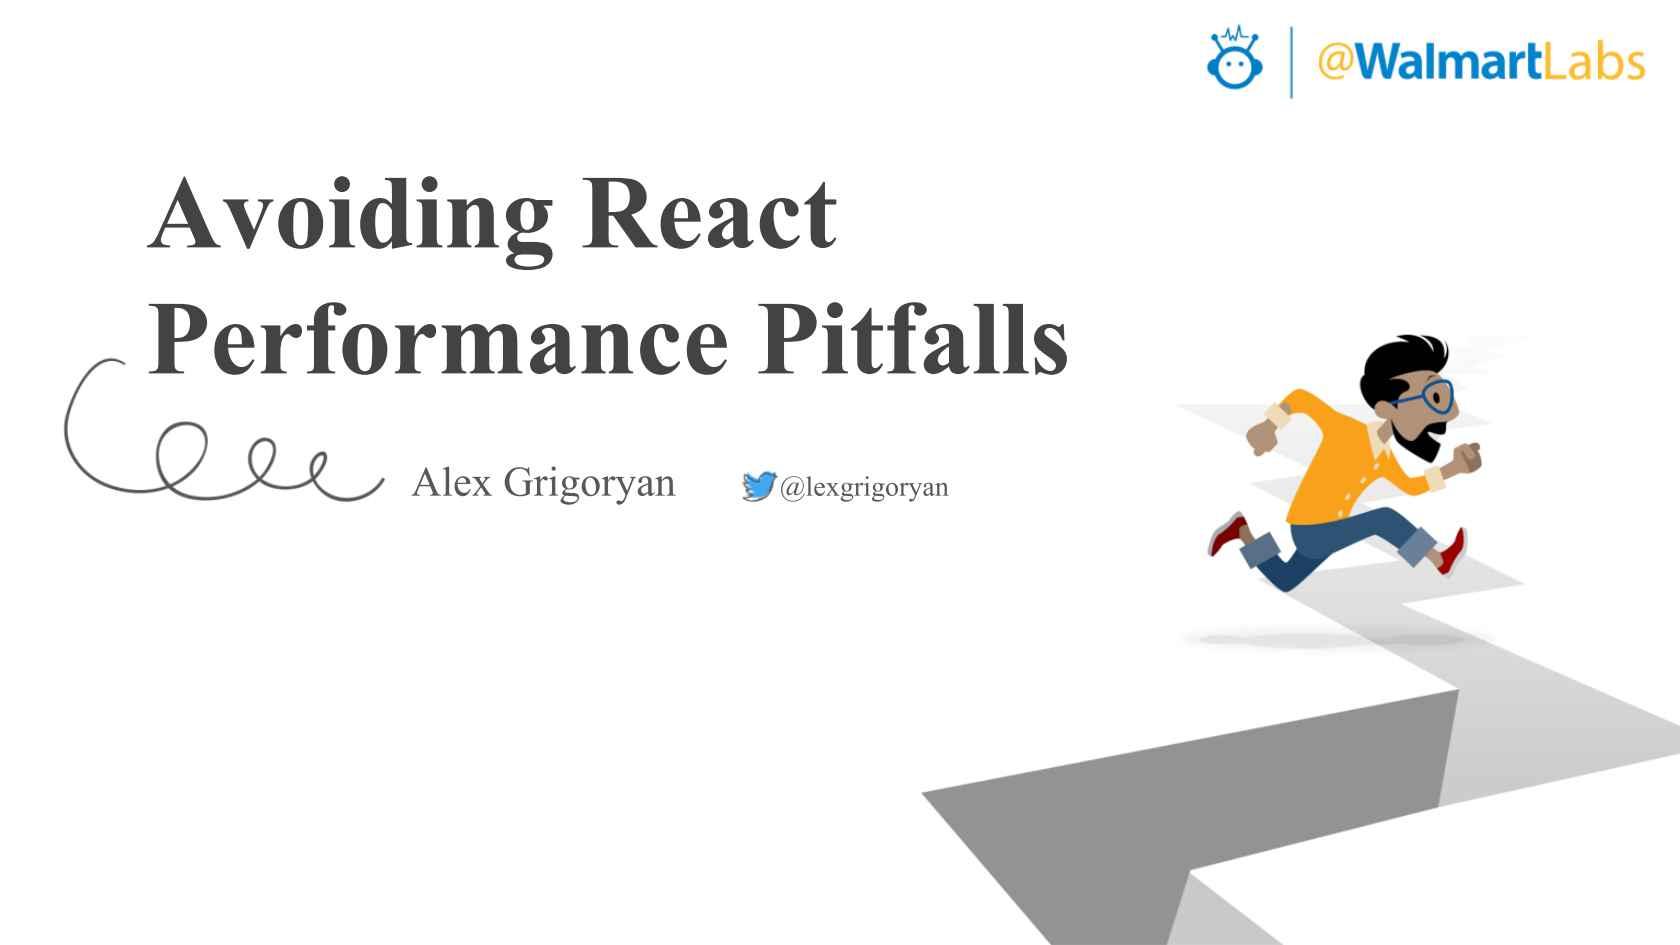 Avoiding React Performance Pitfalls